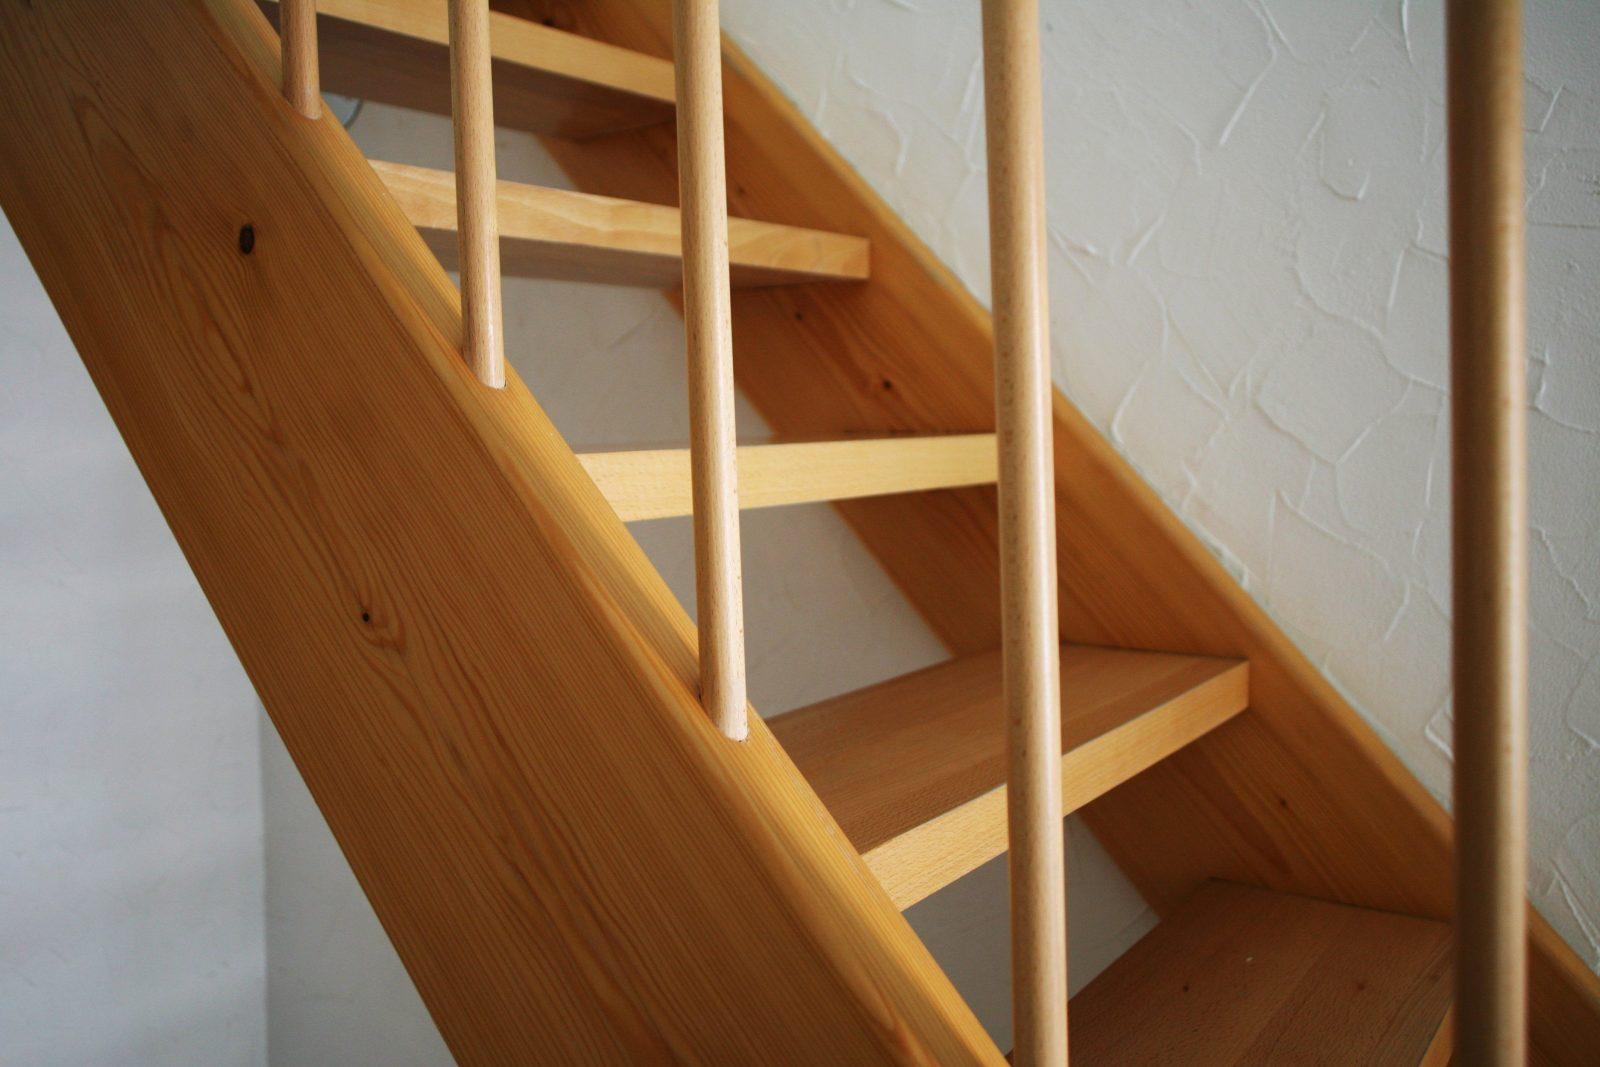 Regal Treppe Selber Bauen Best Treppen Bauen Treppen Bauen 28 Images von Regal Treppe Selber Bauen Bild